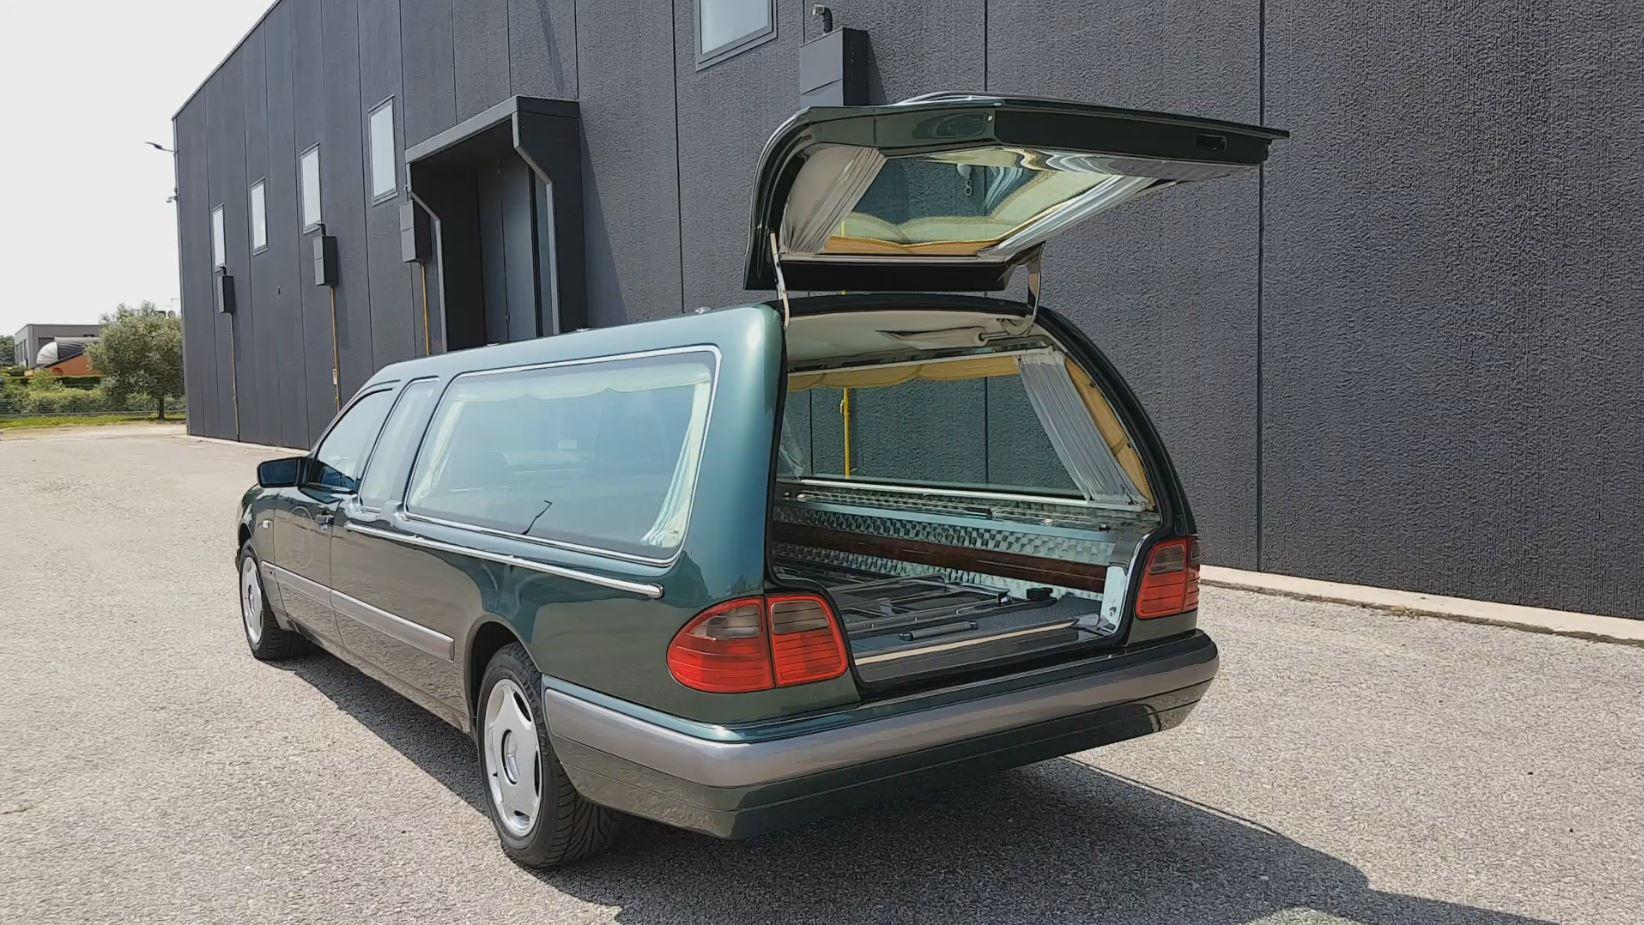 autofunebre-mercedes-usato-261-08